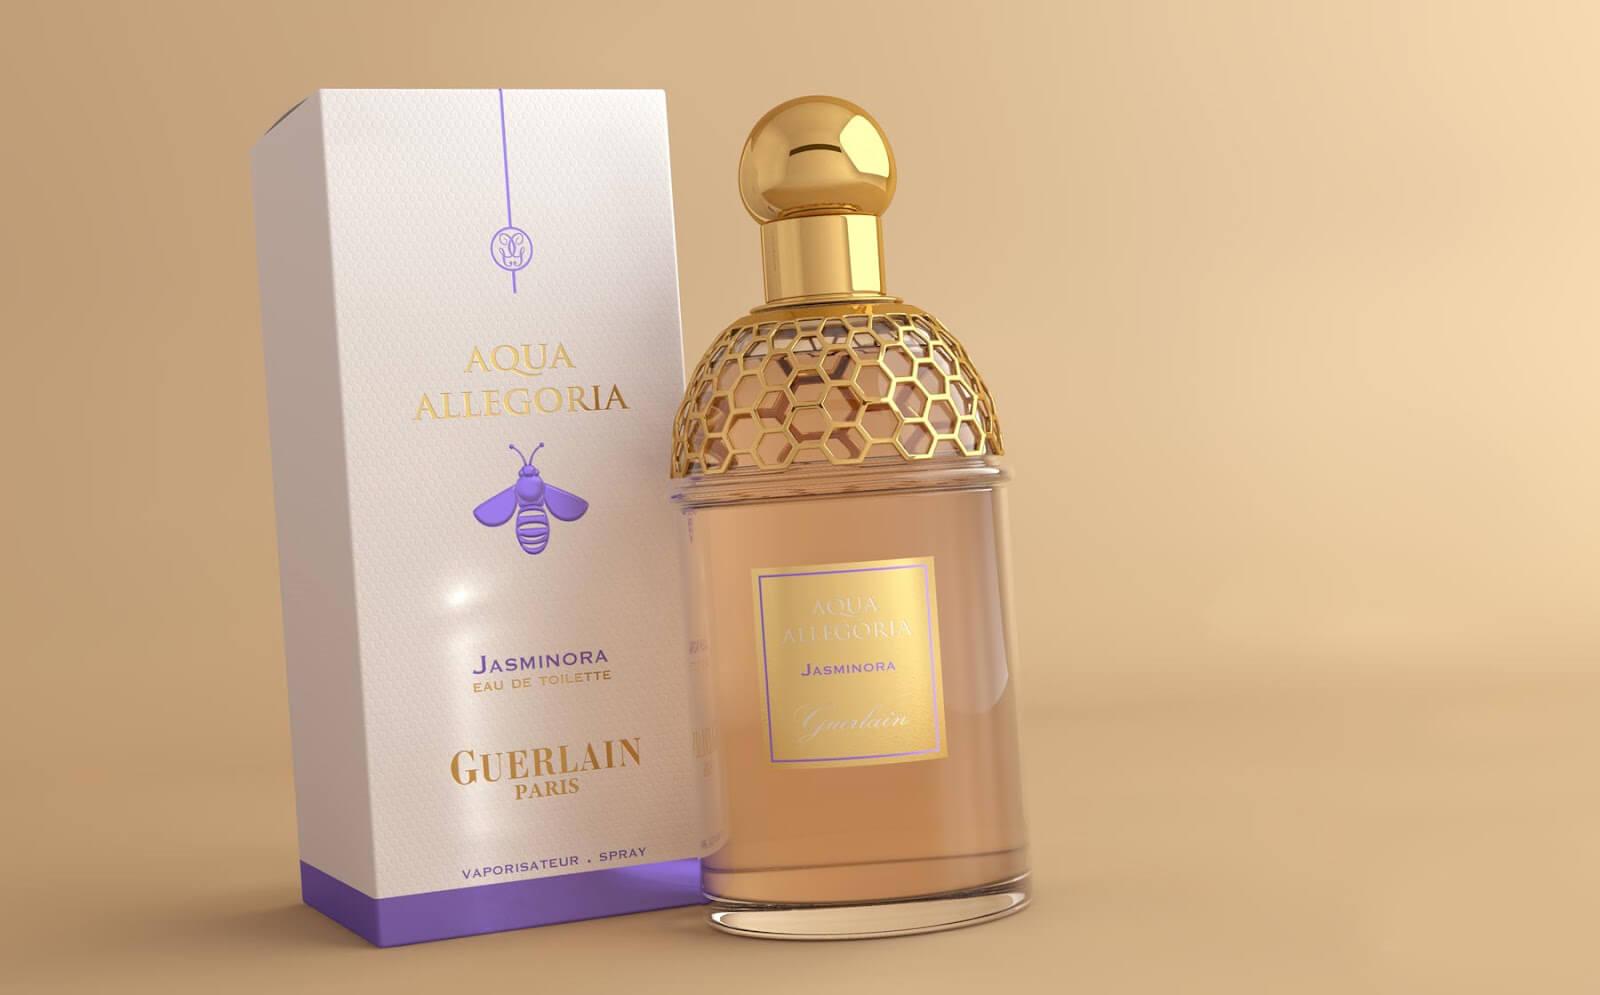 ALLEGORIA-GUERLAIN2_rec